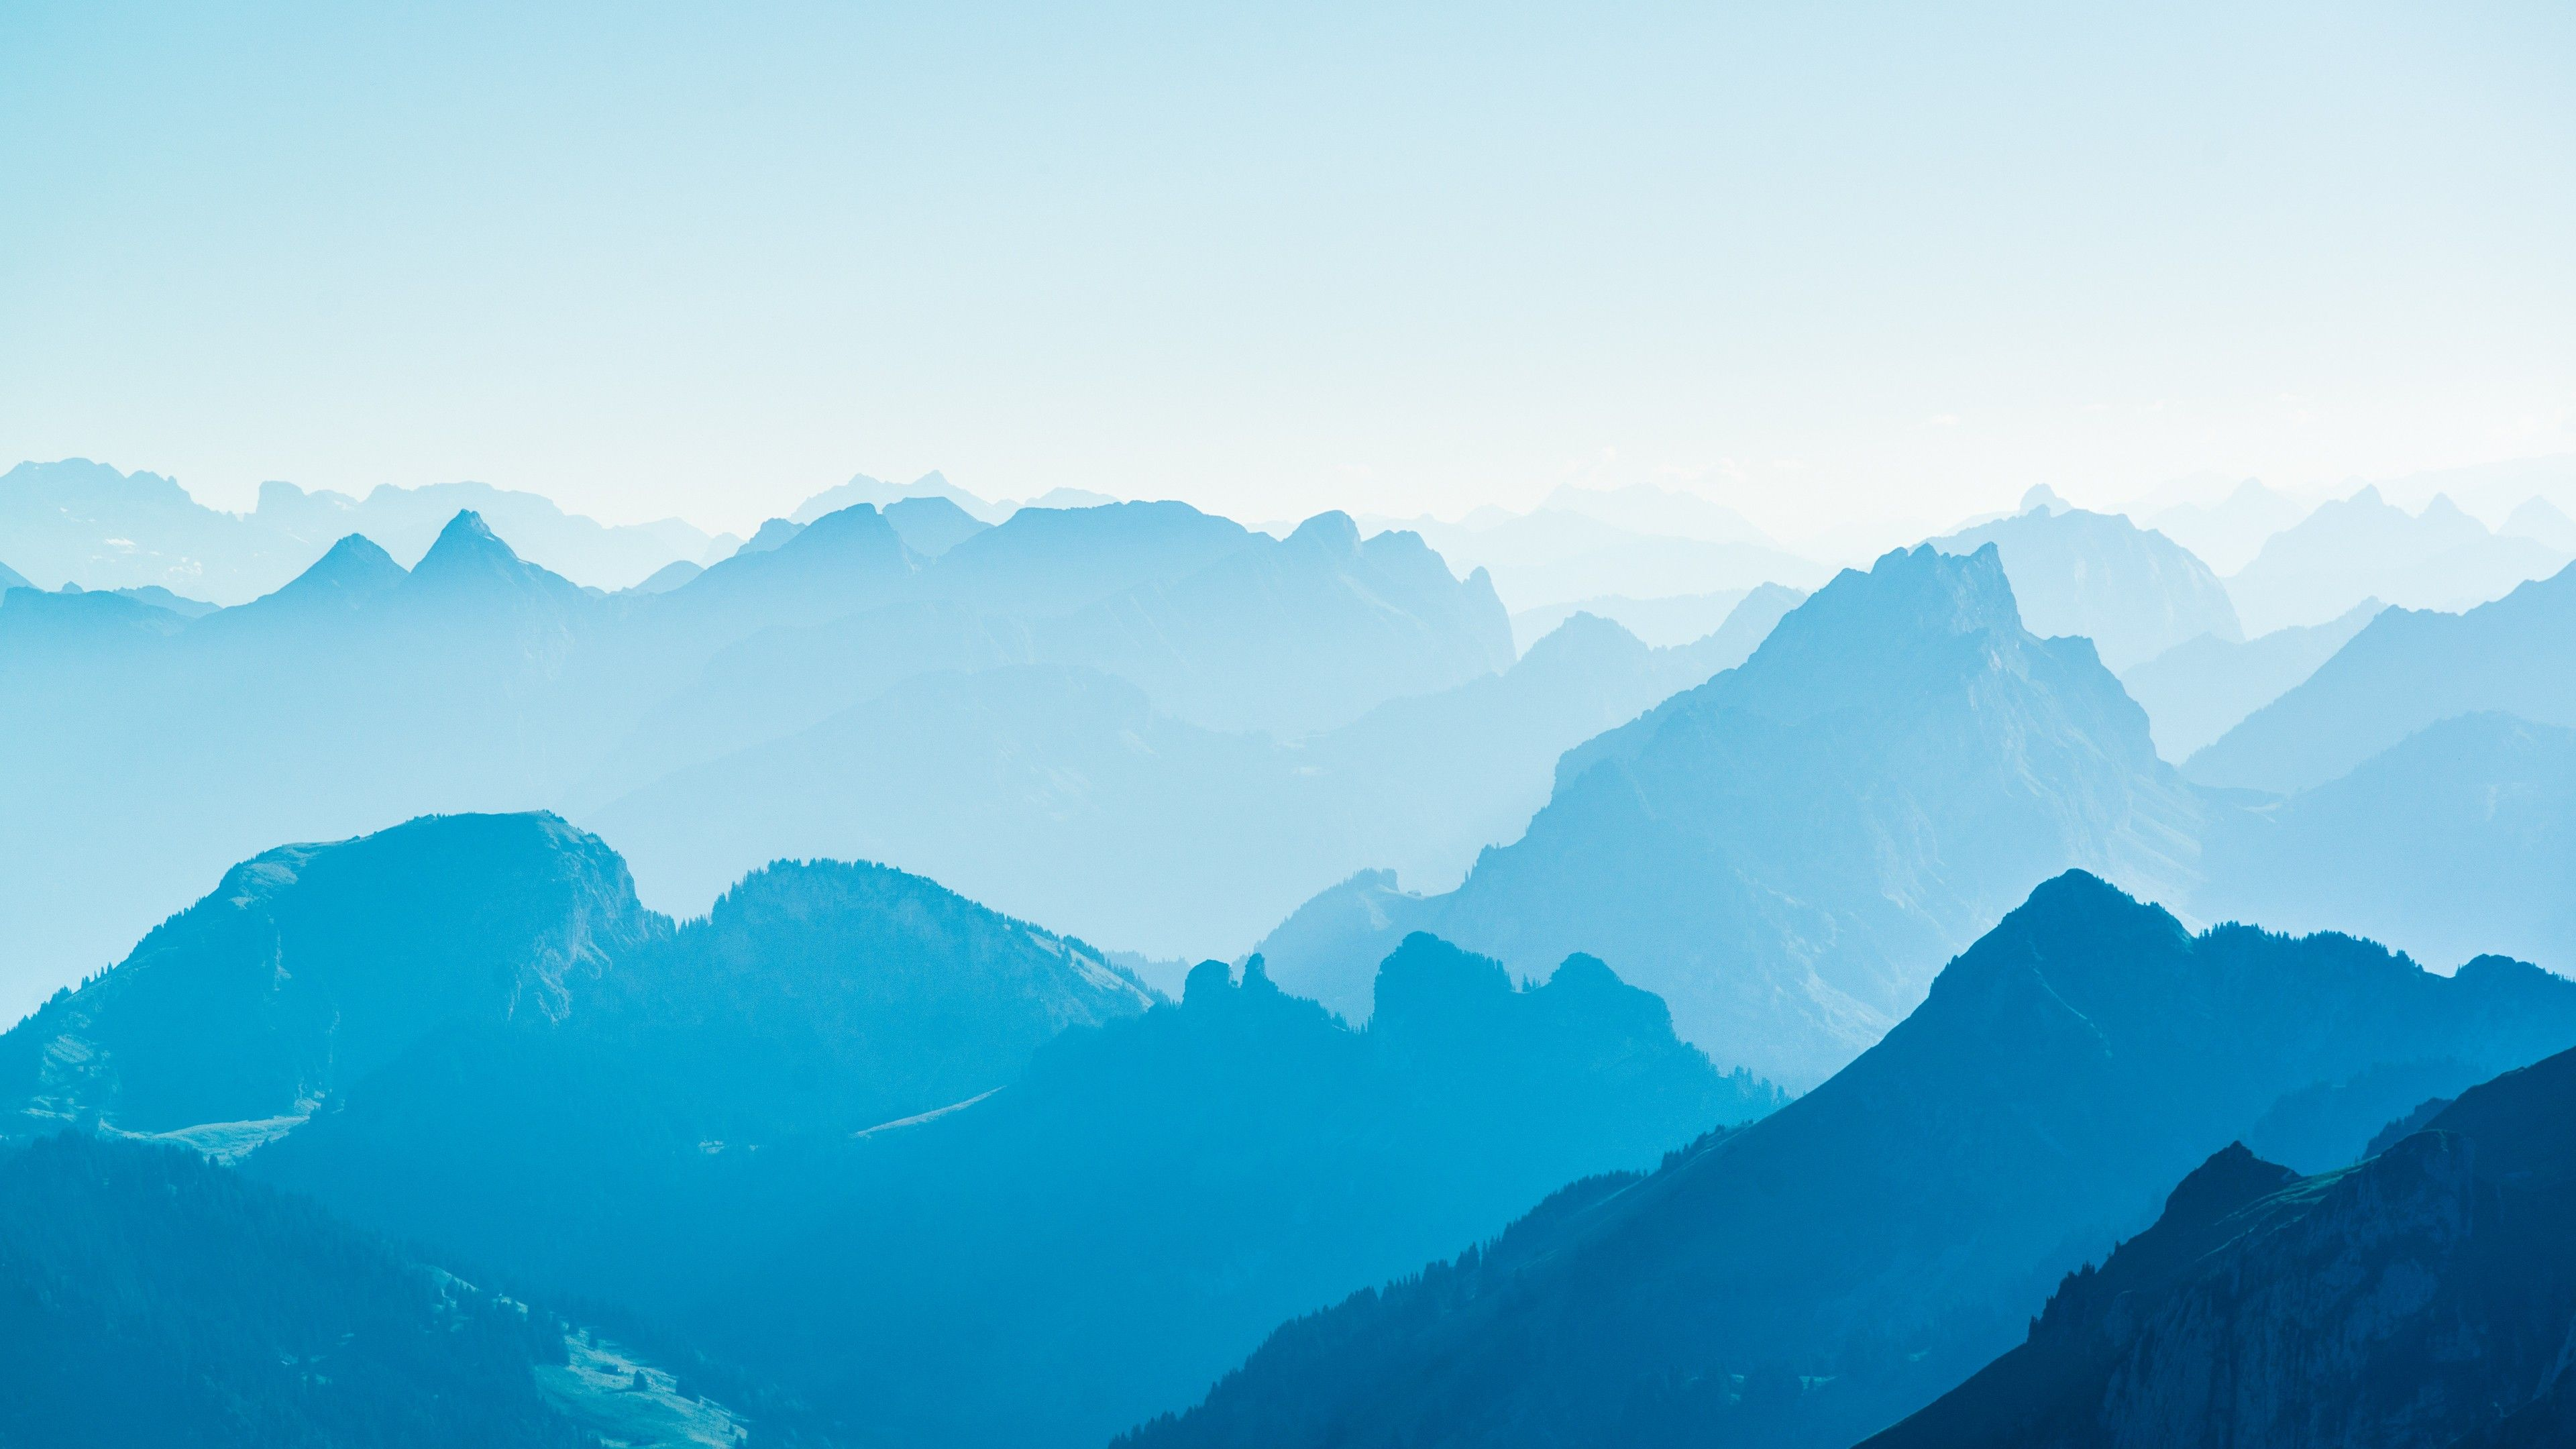 Blue Mountain Range Desktop Wallpaper Mountain Wallpaper Mountains Wallpaper Mountain Images